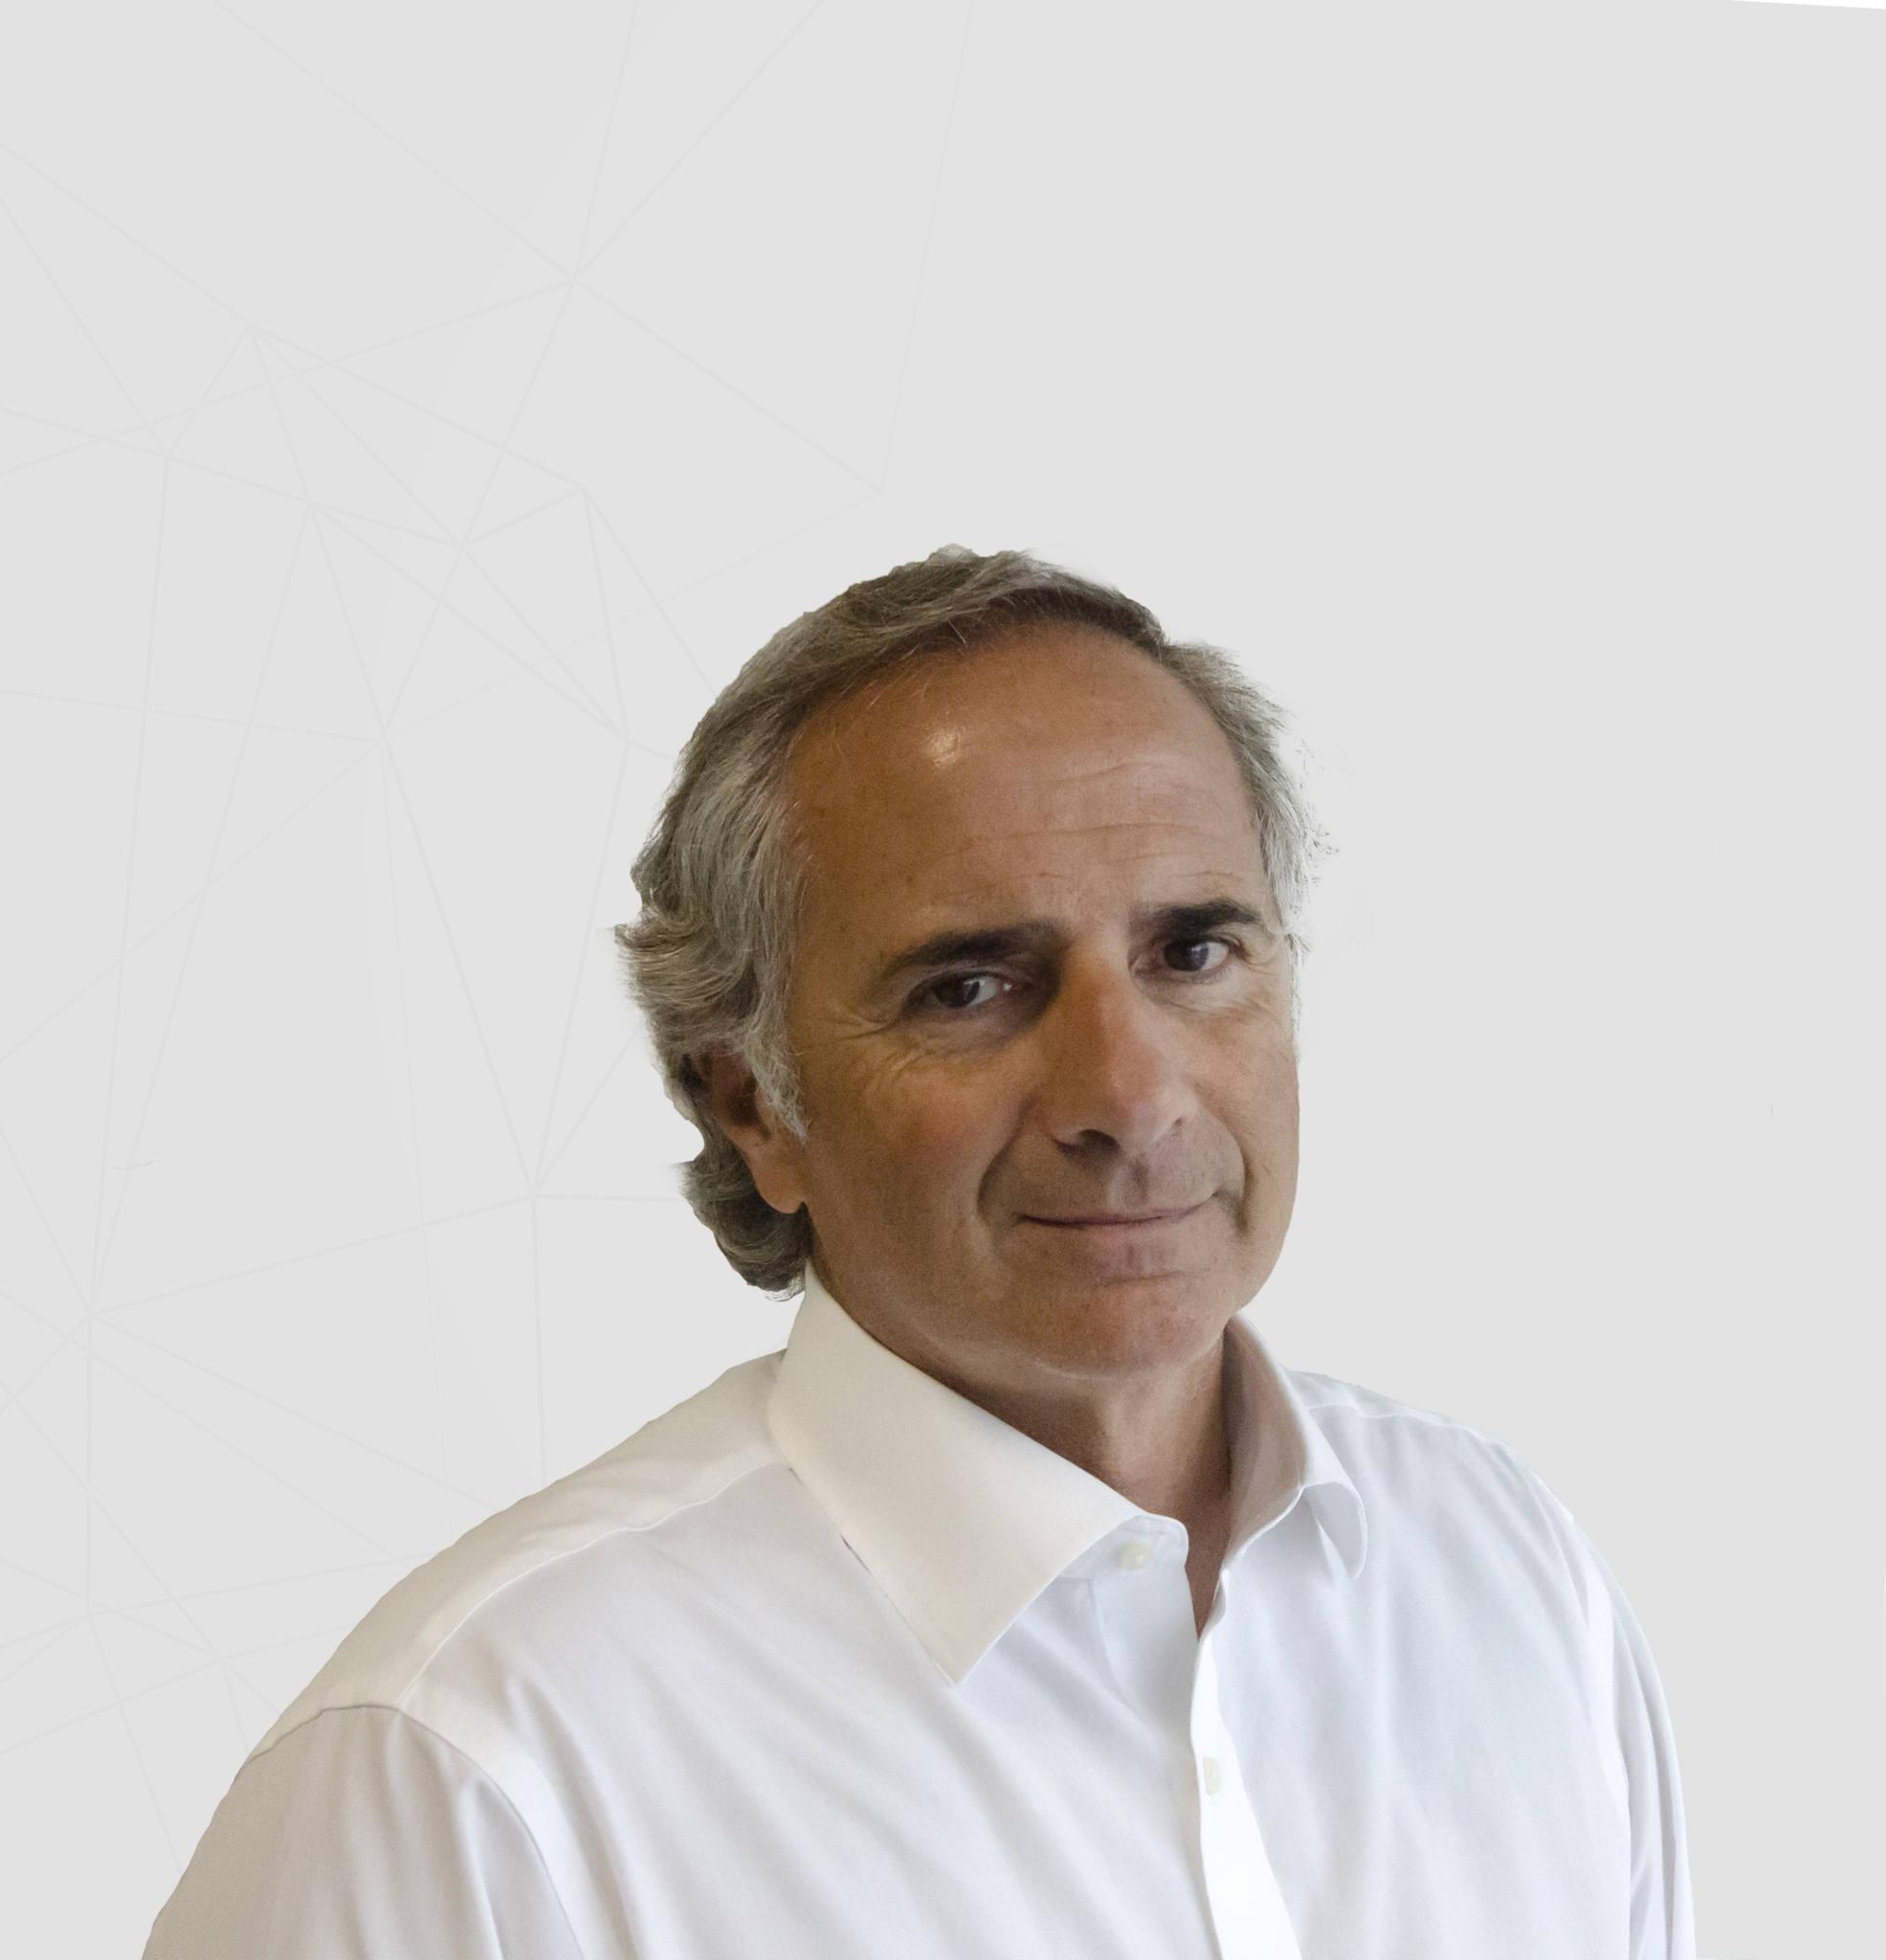 Iñigo J. Losada